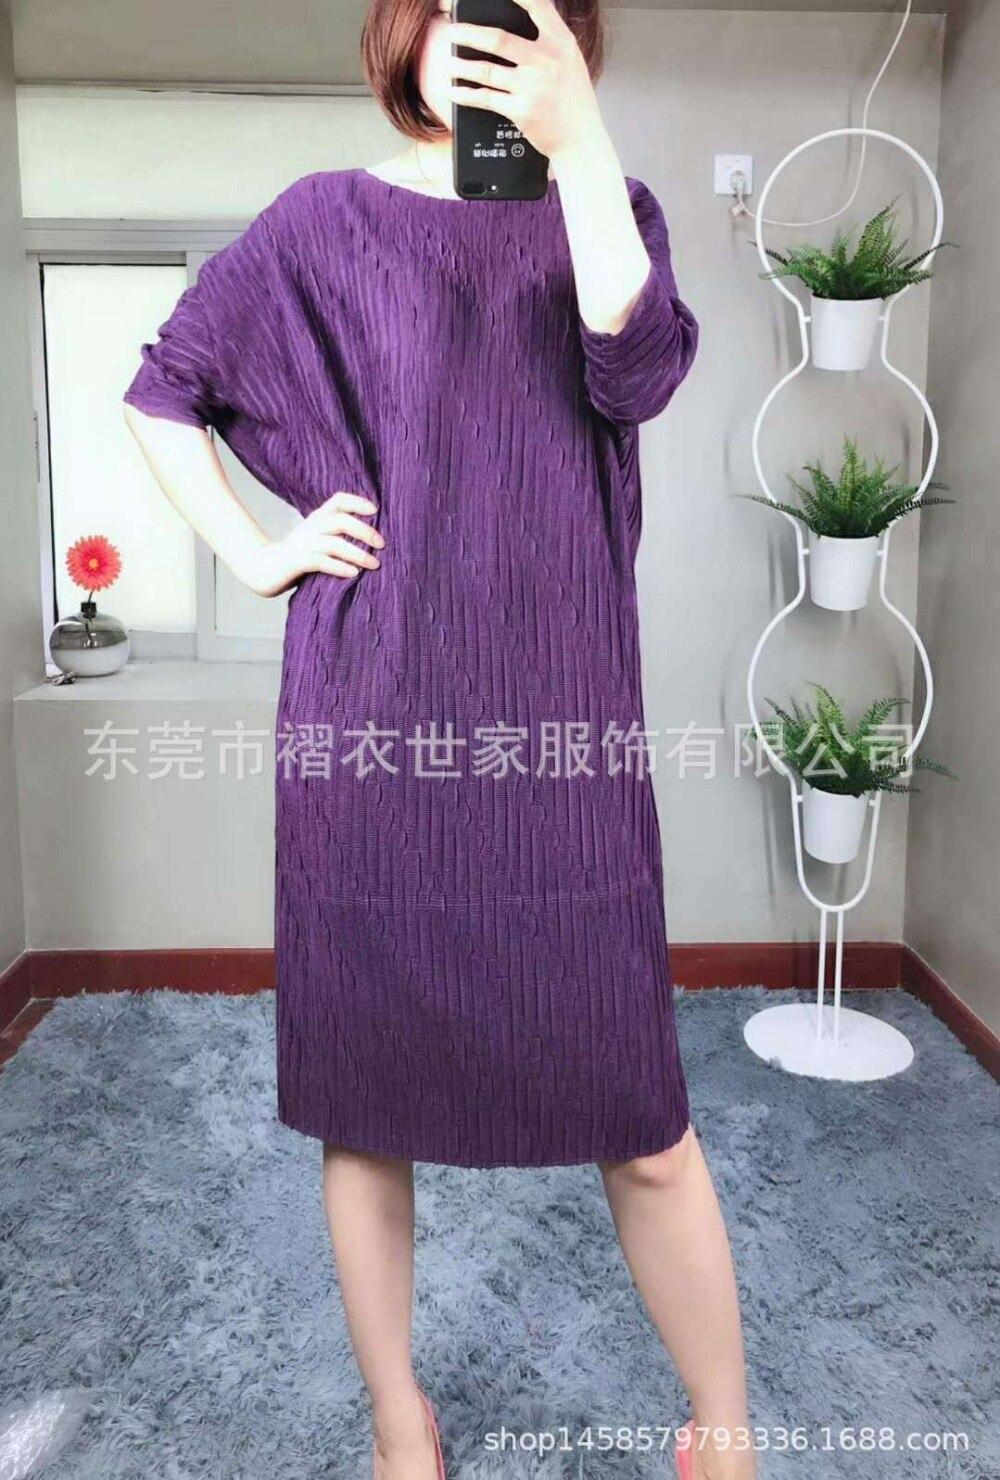 HOT SELLING Miyake Fashion fold o-neck half sleeve Embossed loose batwing sleeve dress IN STOCK